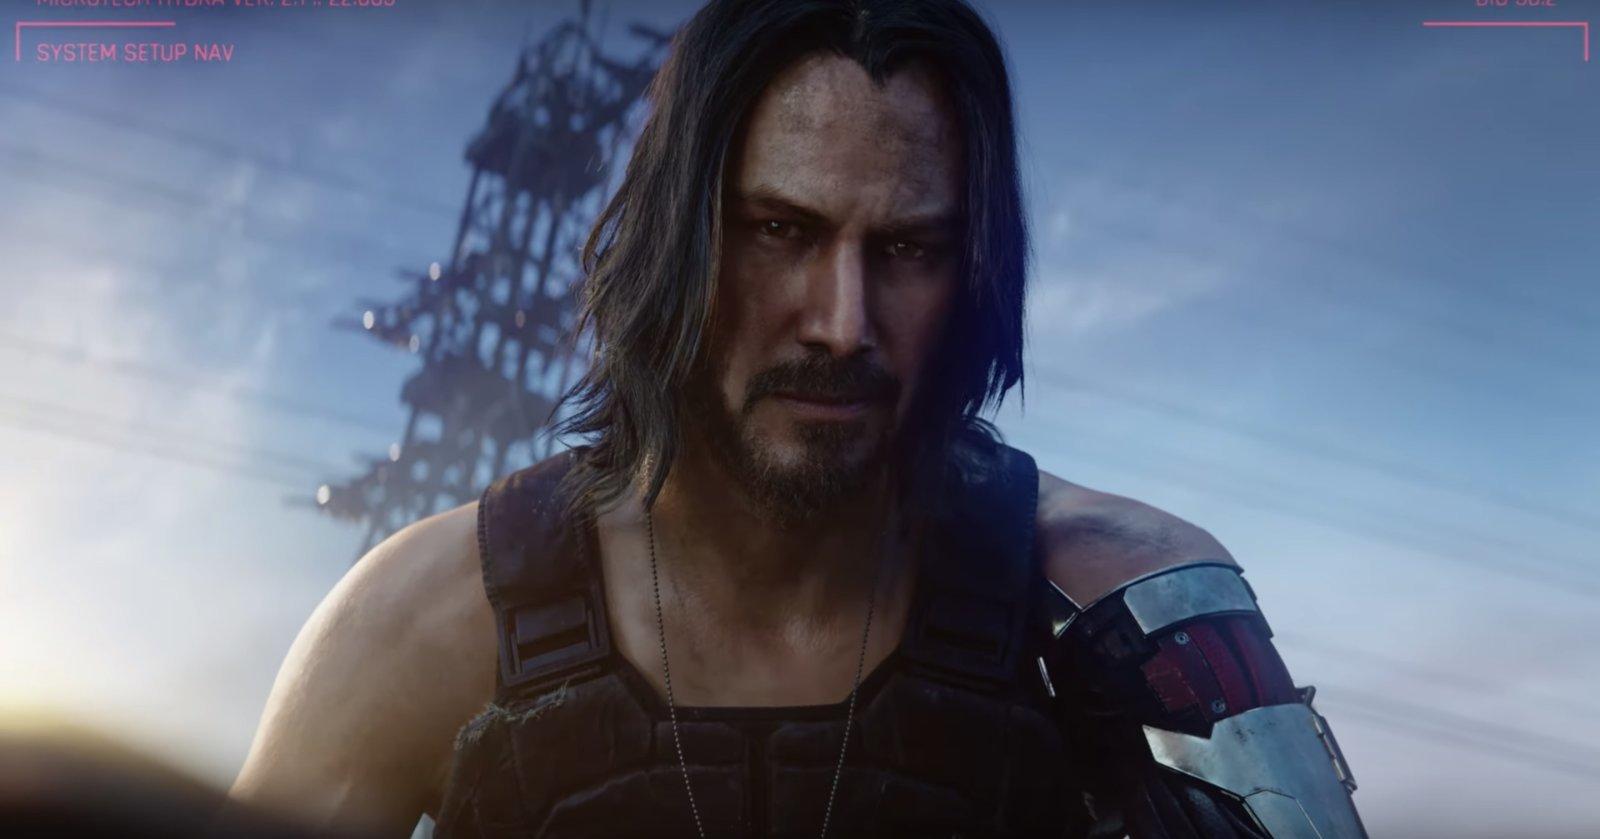 Sony retira videogame Cyberpunk 2077 da PlayStation Store por bugs